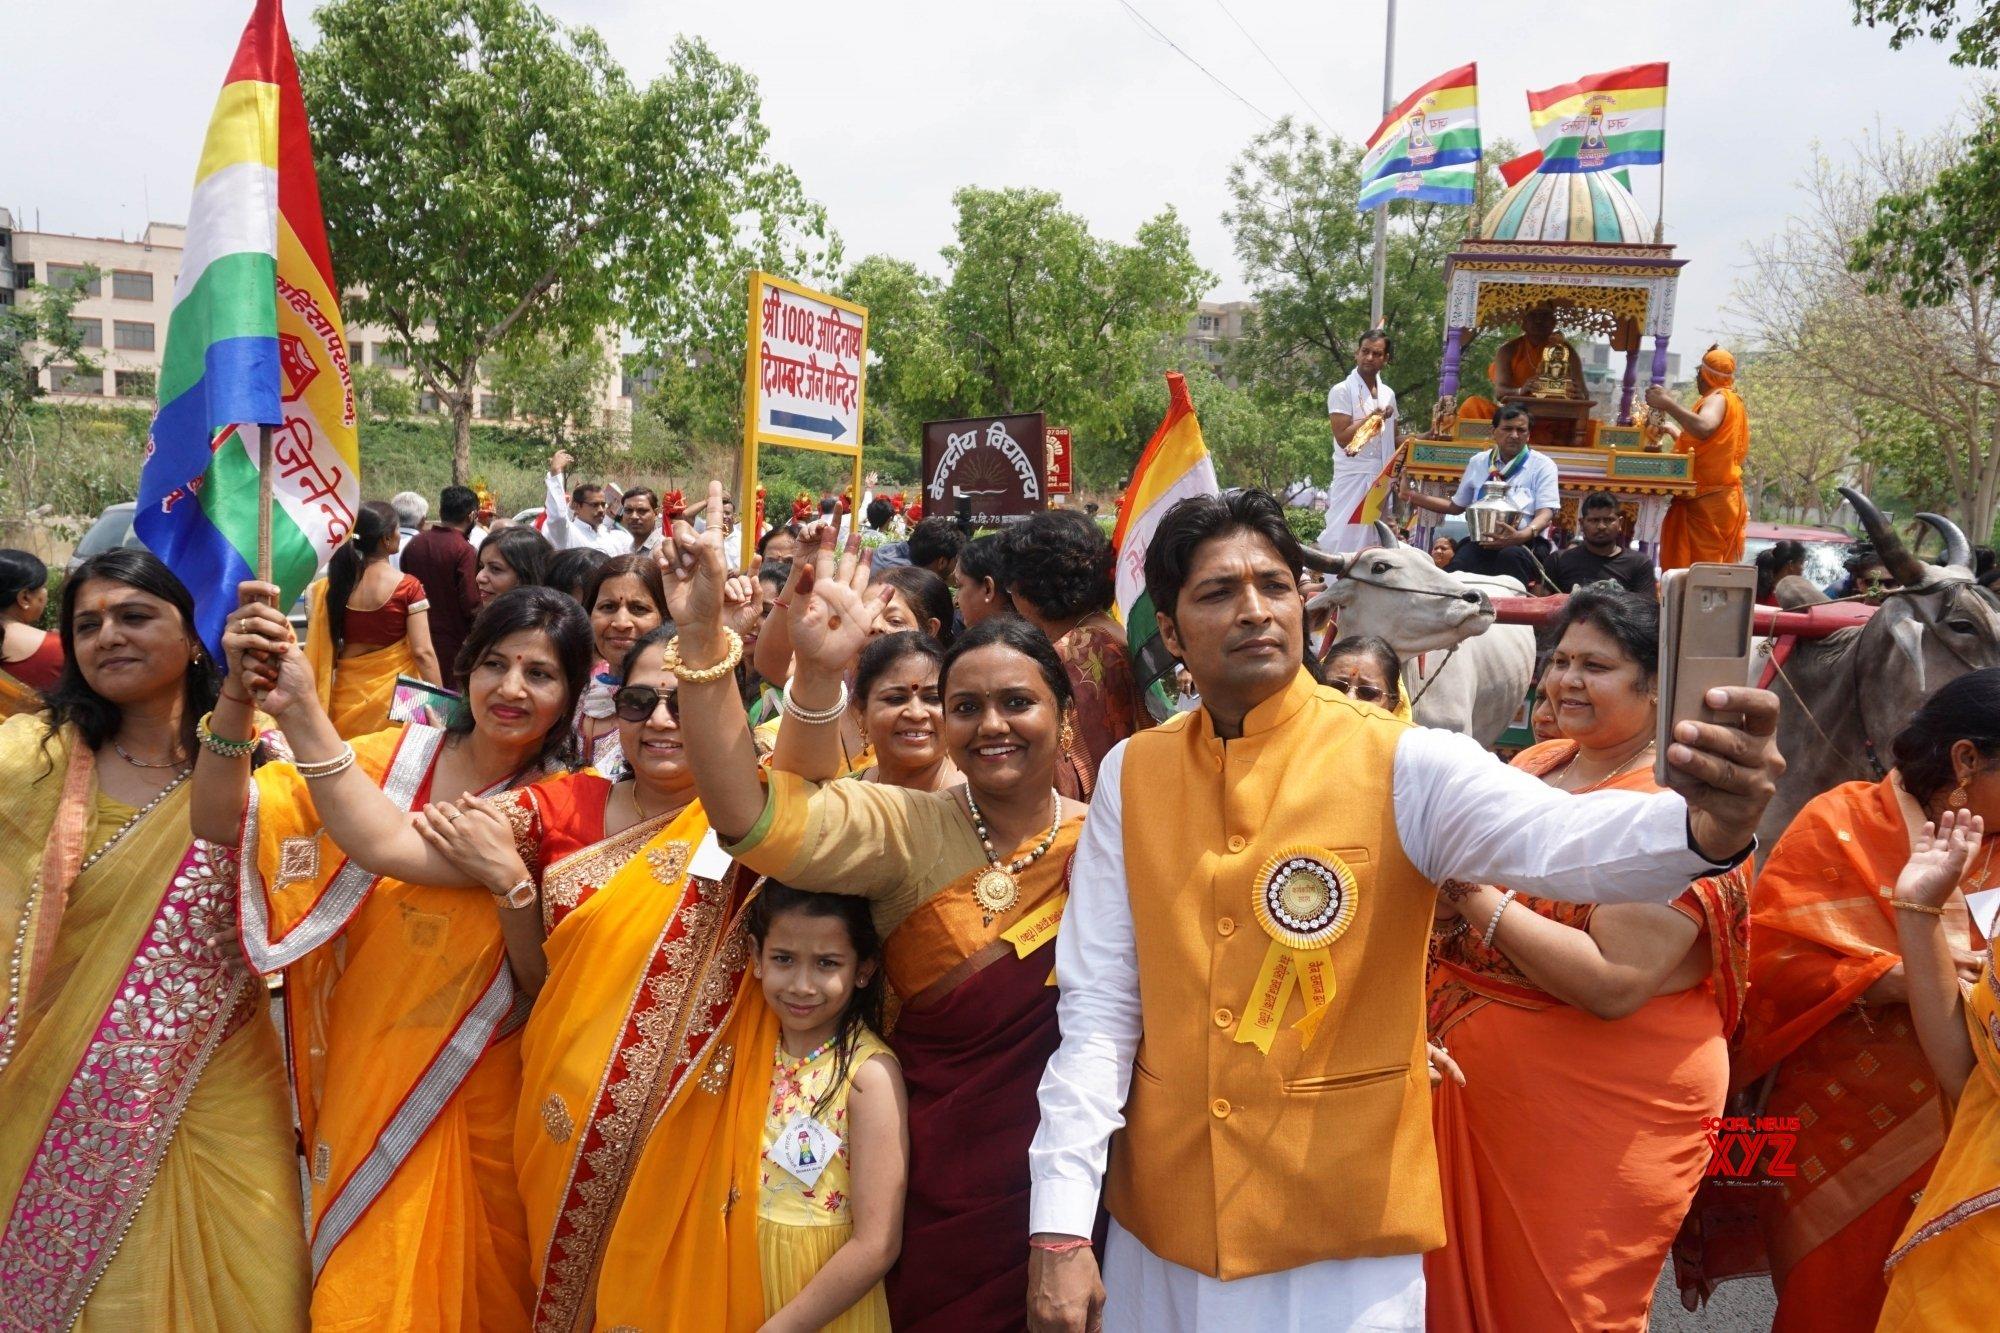 New Delhi: Mahavir Jayanti - Devotees during 'Shobha Yatra' #Gallery